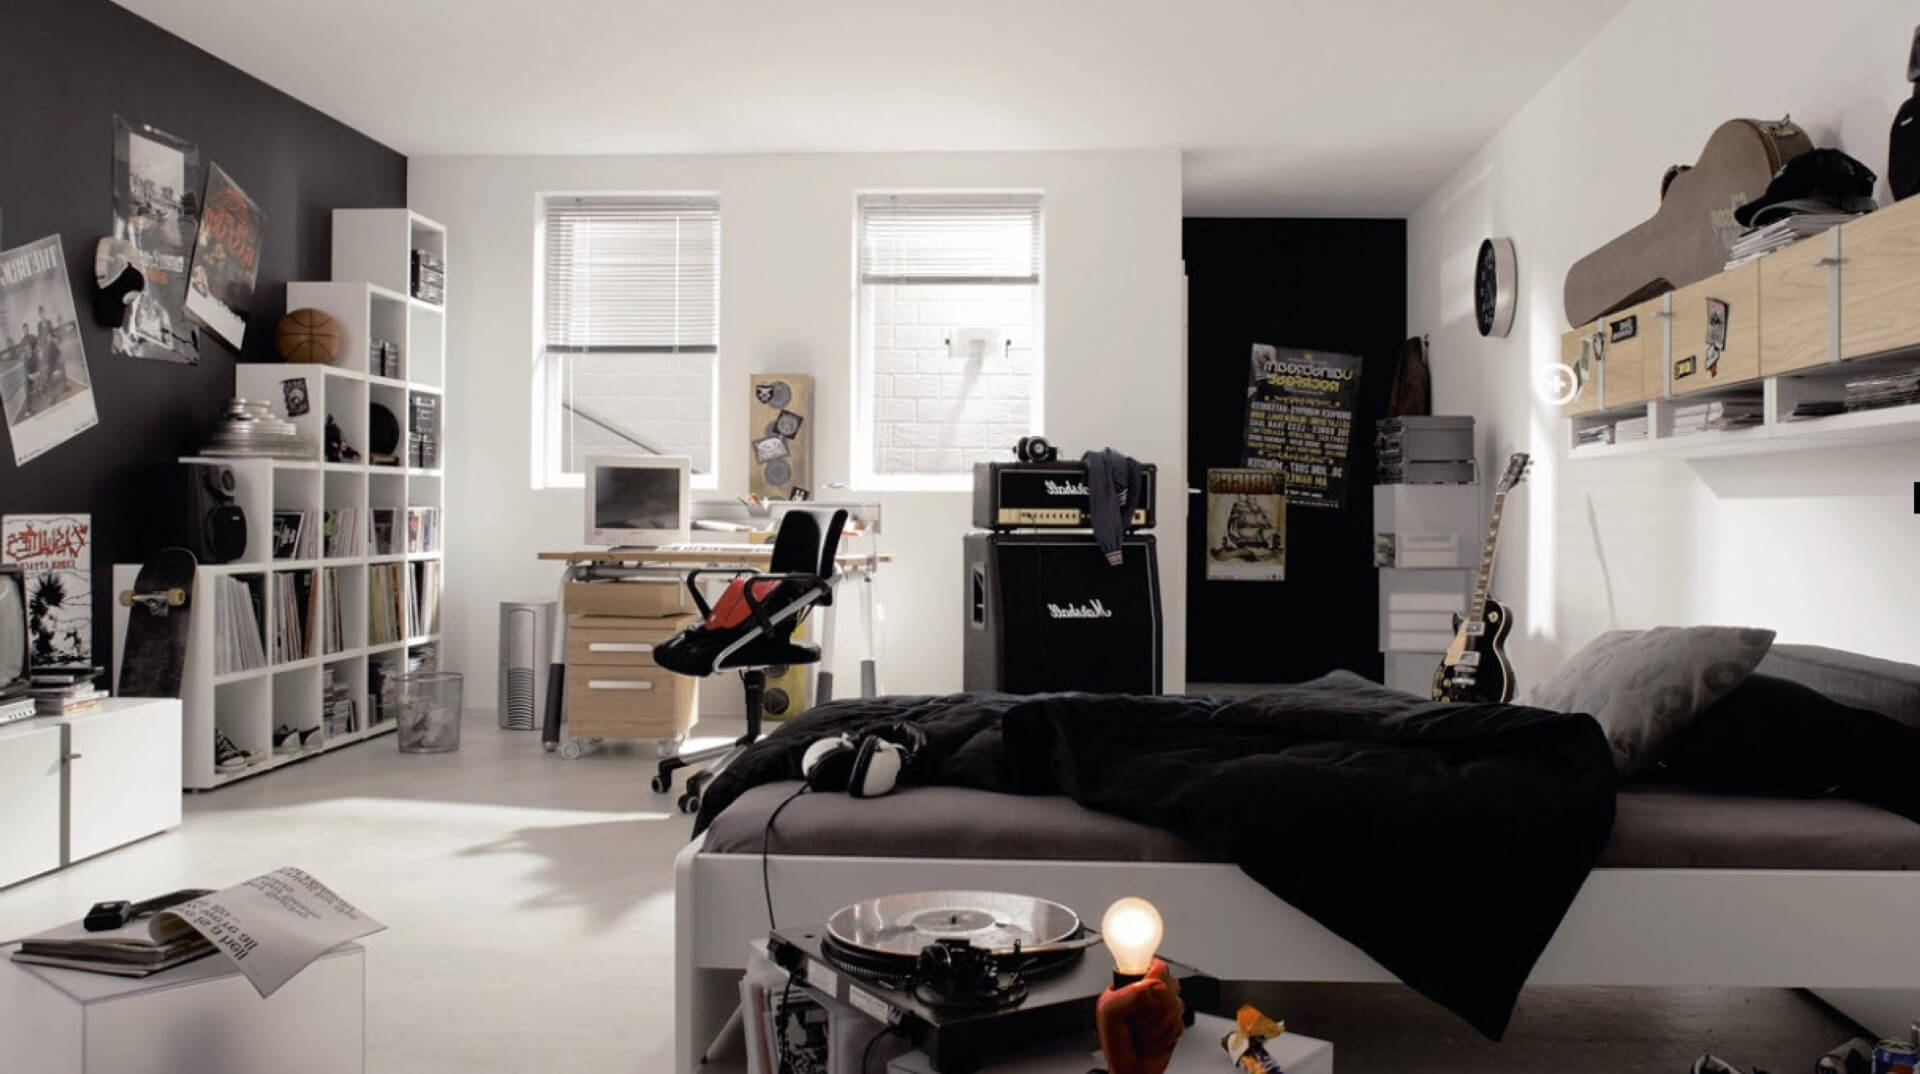 The Coolest Room Decor Ideas for Teenage Boys